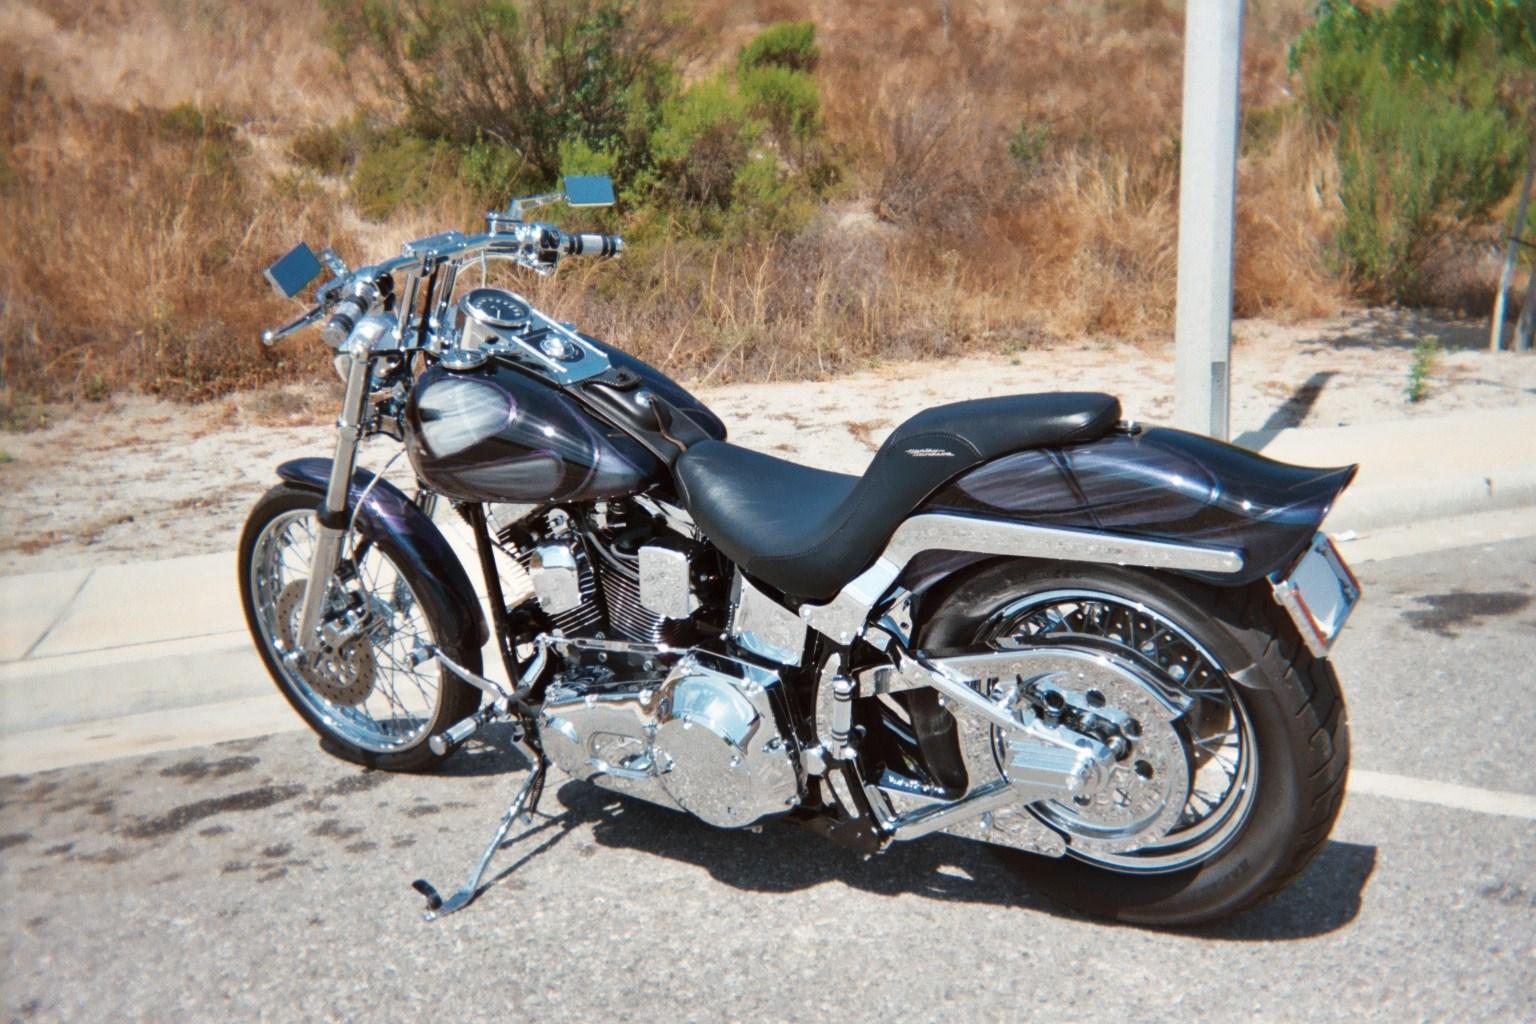 Https Www Chopperexchange Com For Sale Harley Davidson Road King Police